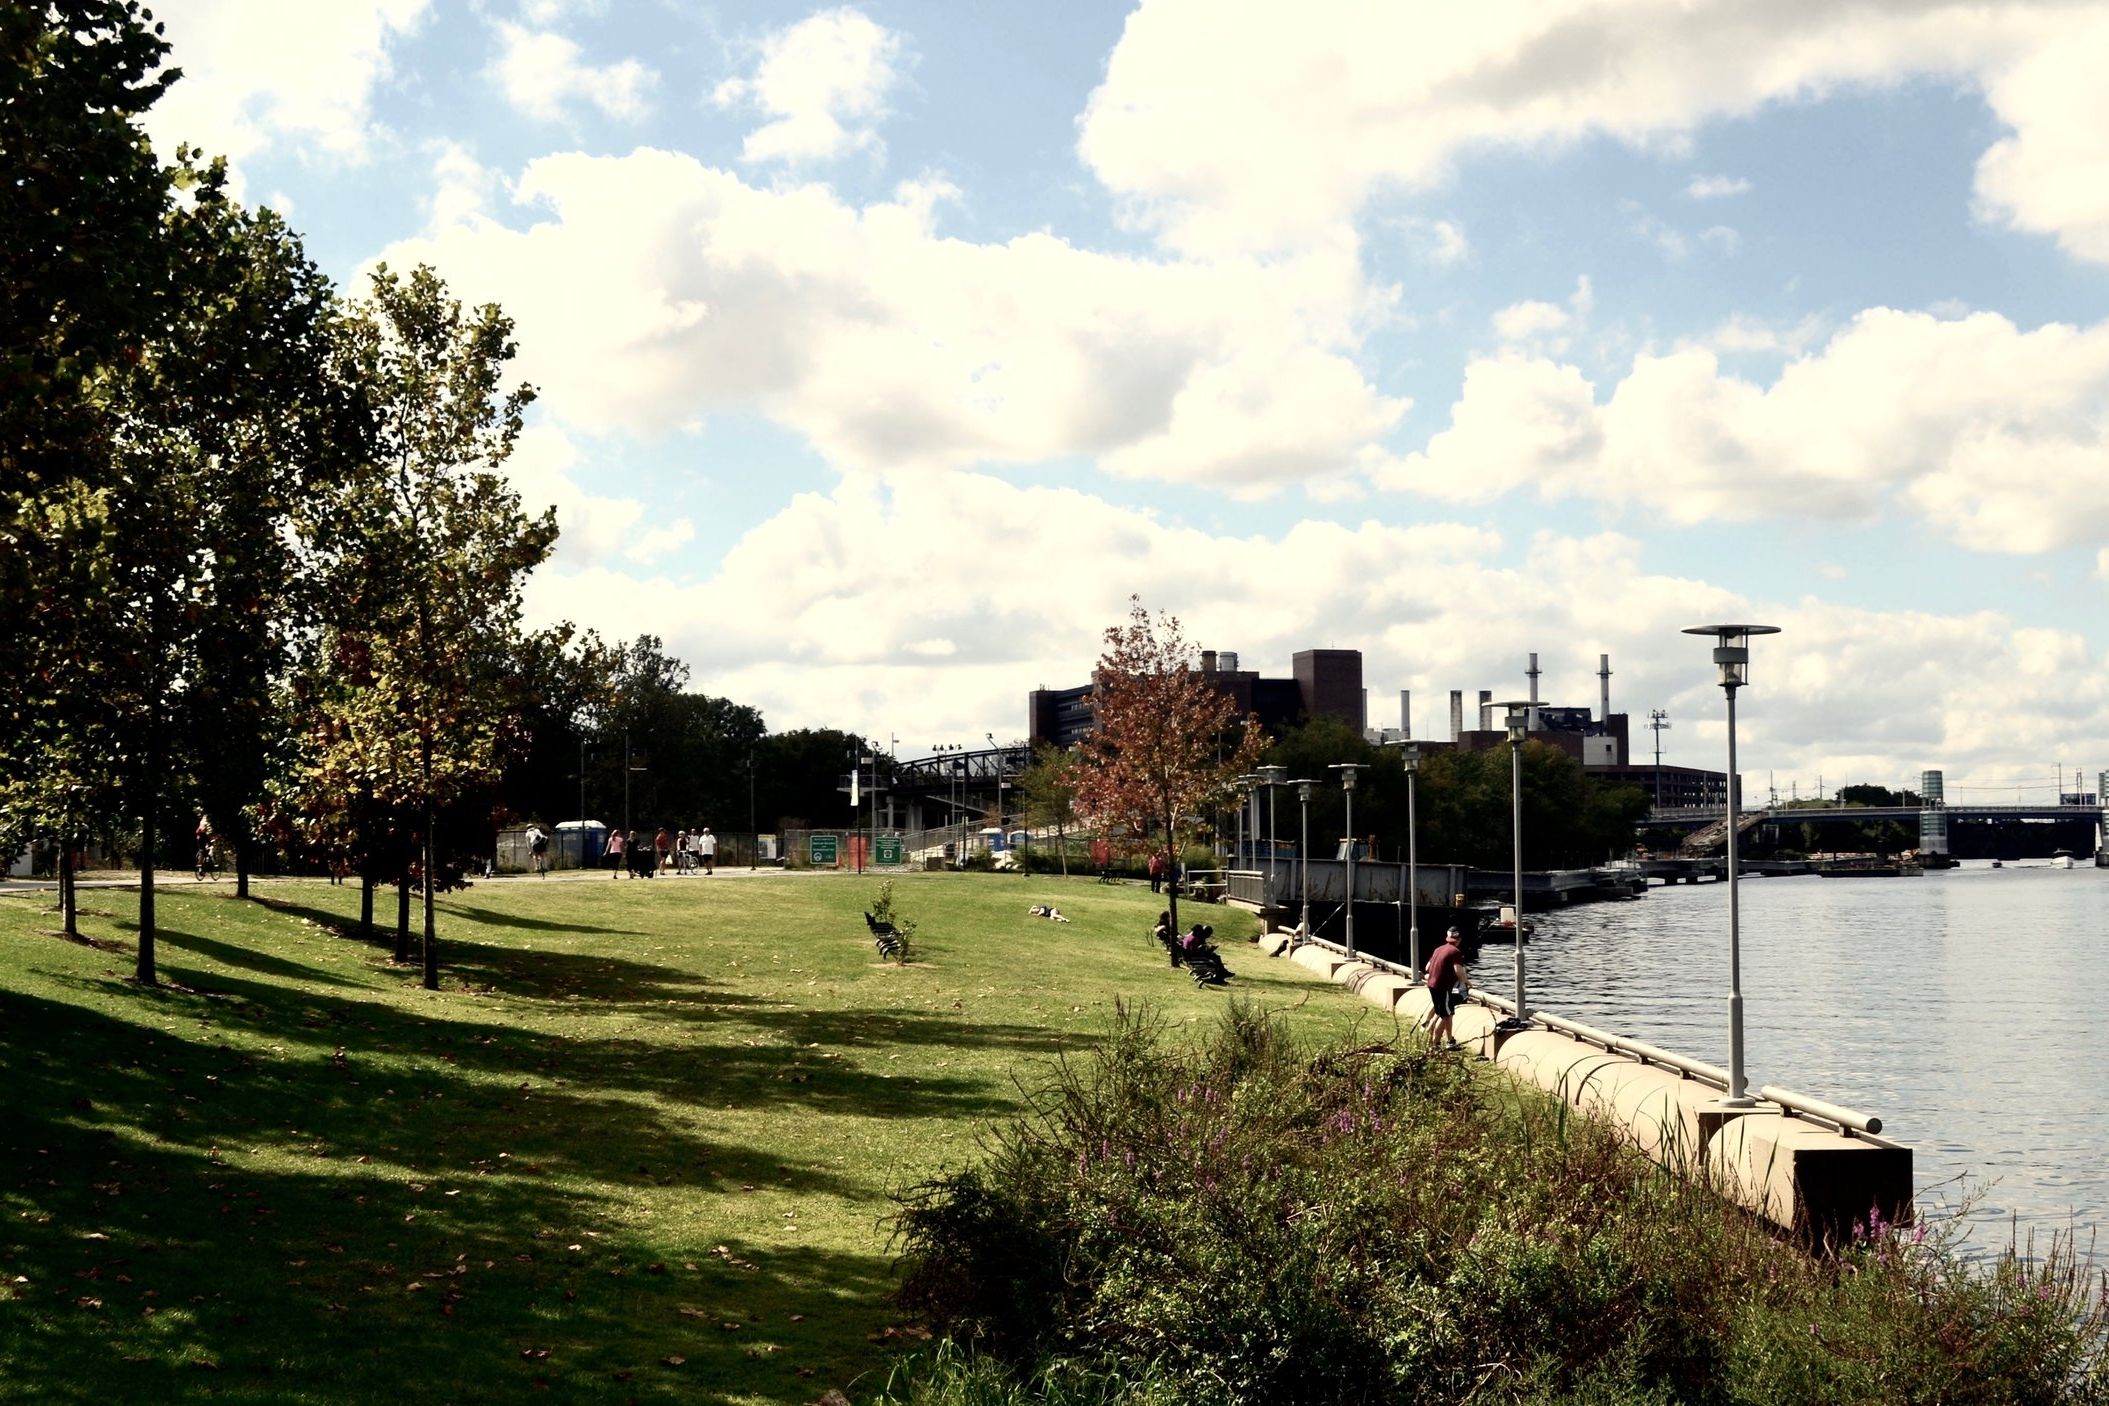 schuylkill river park on an autumn afternoon